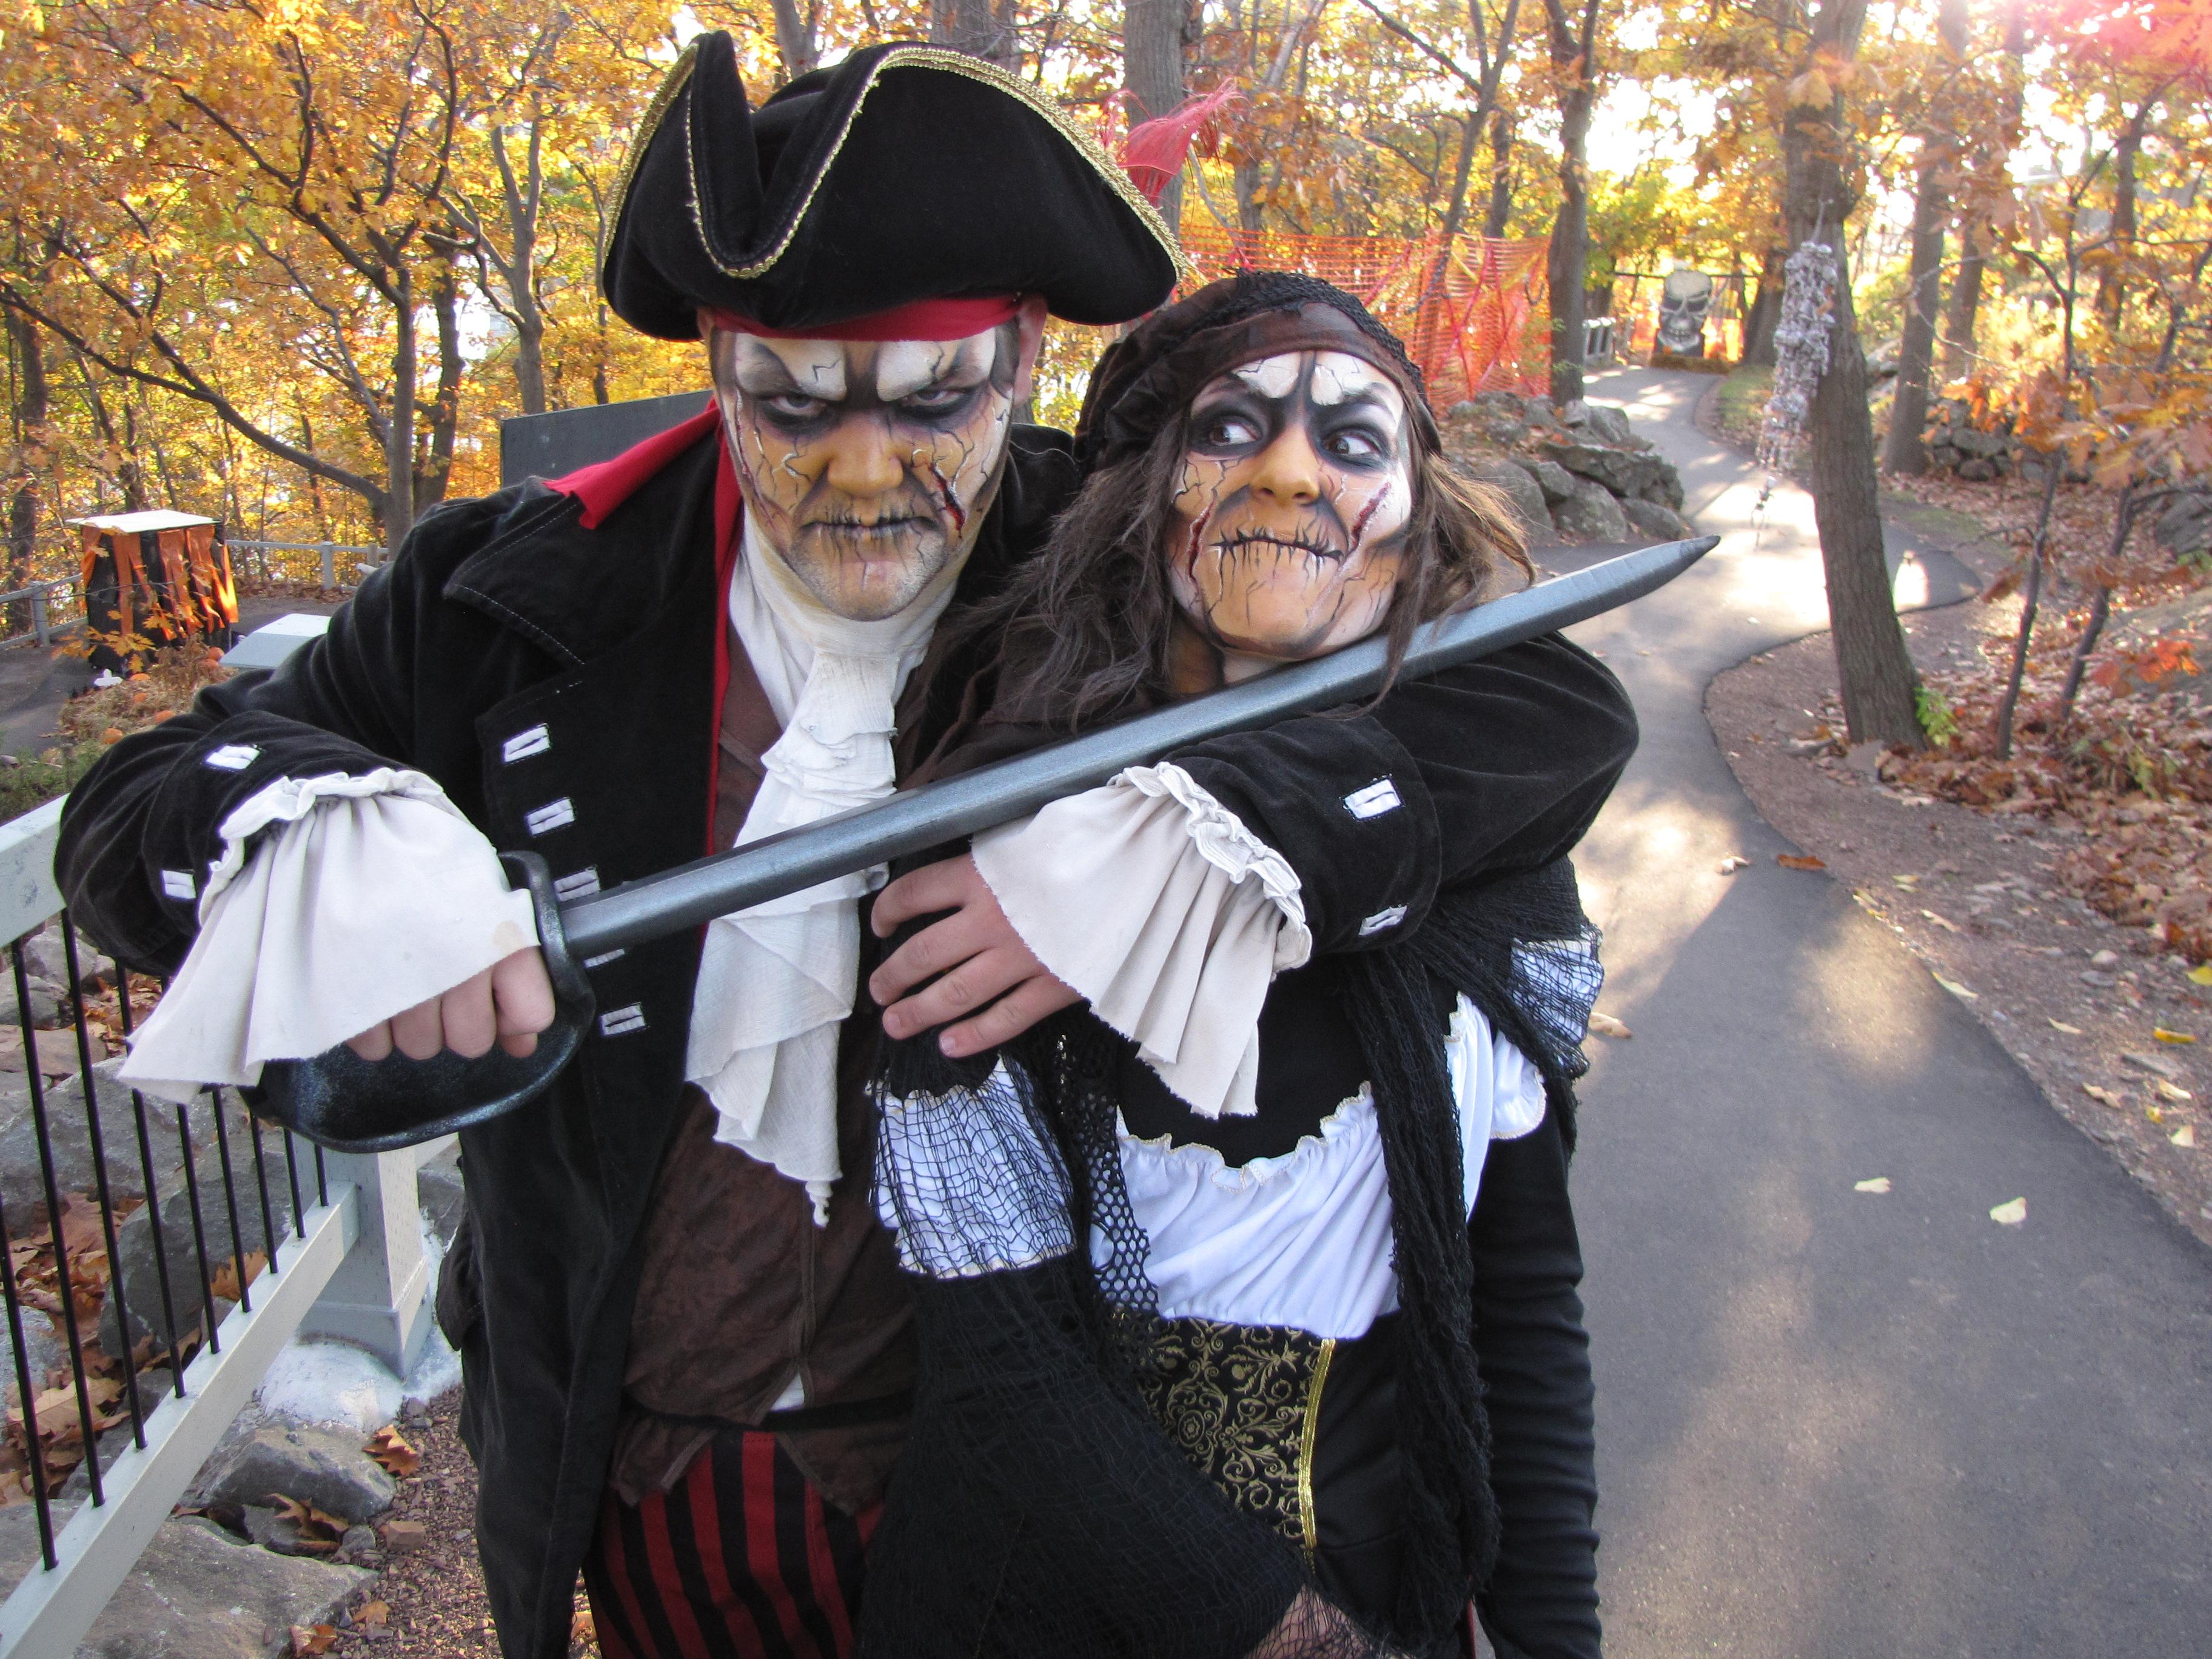 2012-10-18-08-54-26-AP ACT Aquarium du Québec Nuit des pirates 18 10 26 10 VD